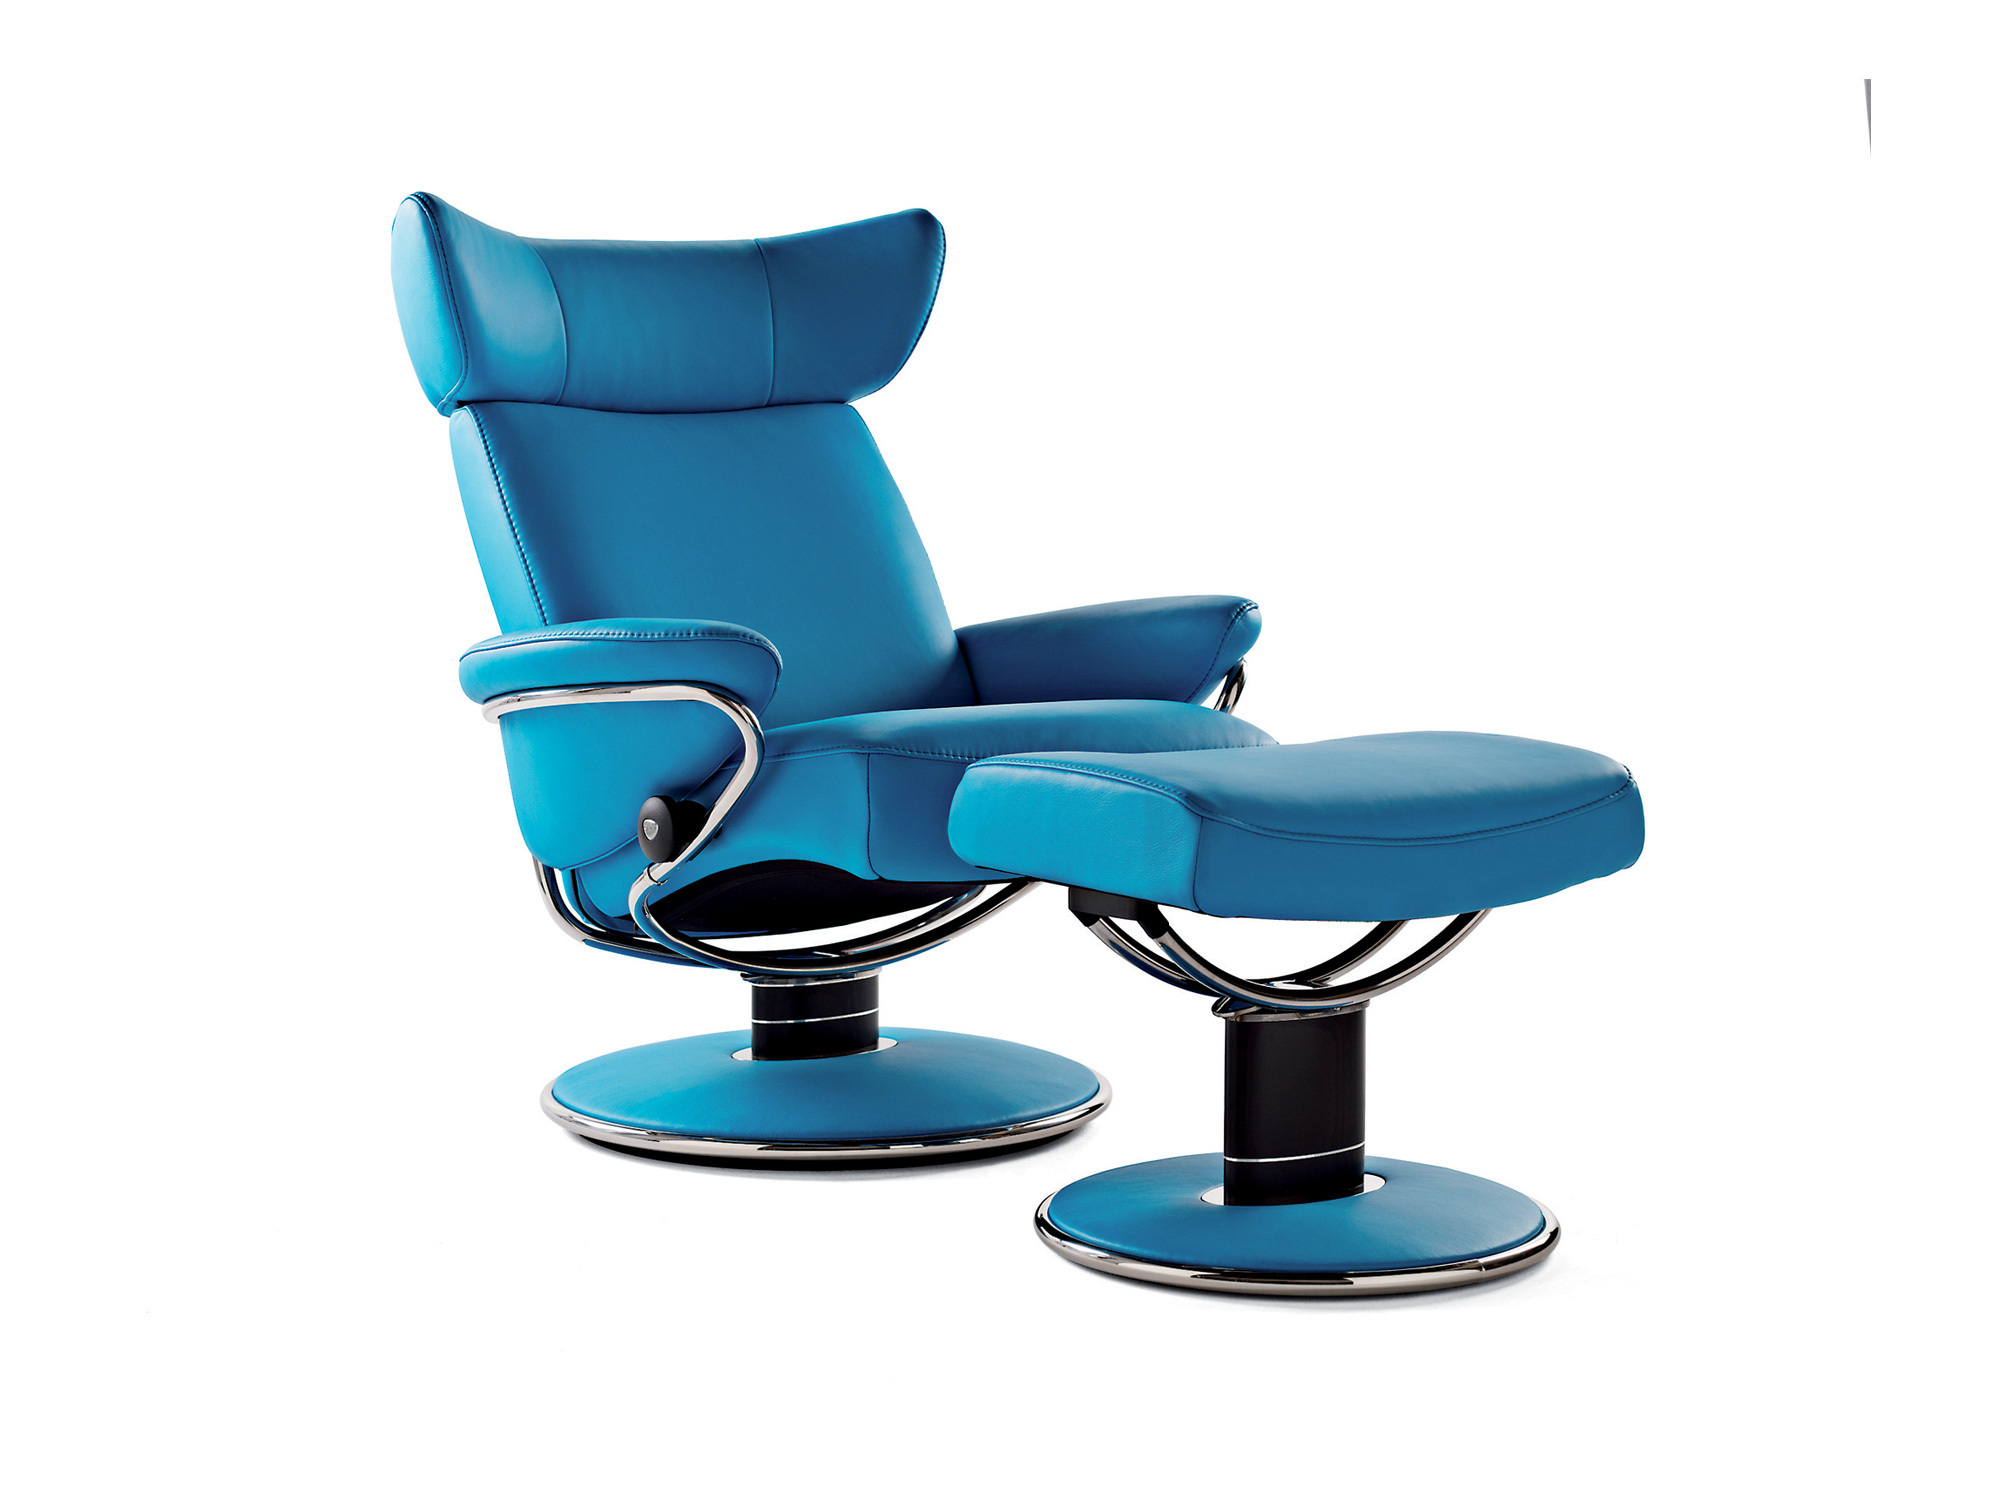 stressless jazz tv tuoli rahi stressless tv tuolit lepotuolit tuotteet maskun kalustetalo. Black Bedroom Furniture Sets. Home Design Ideas